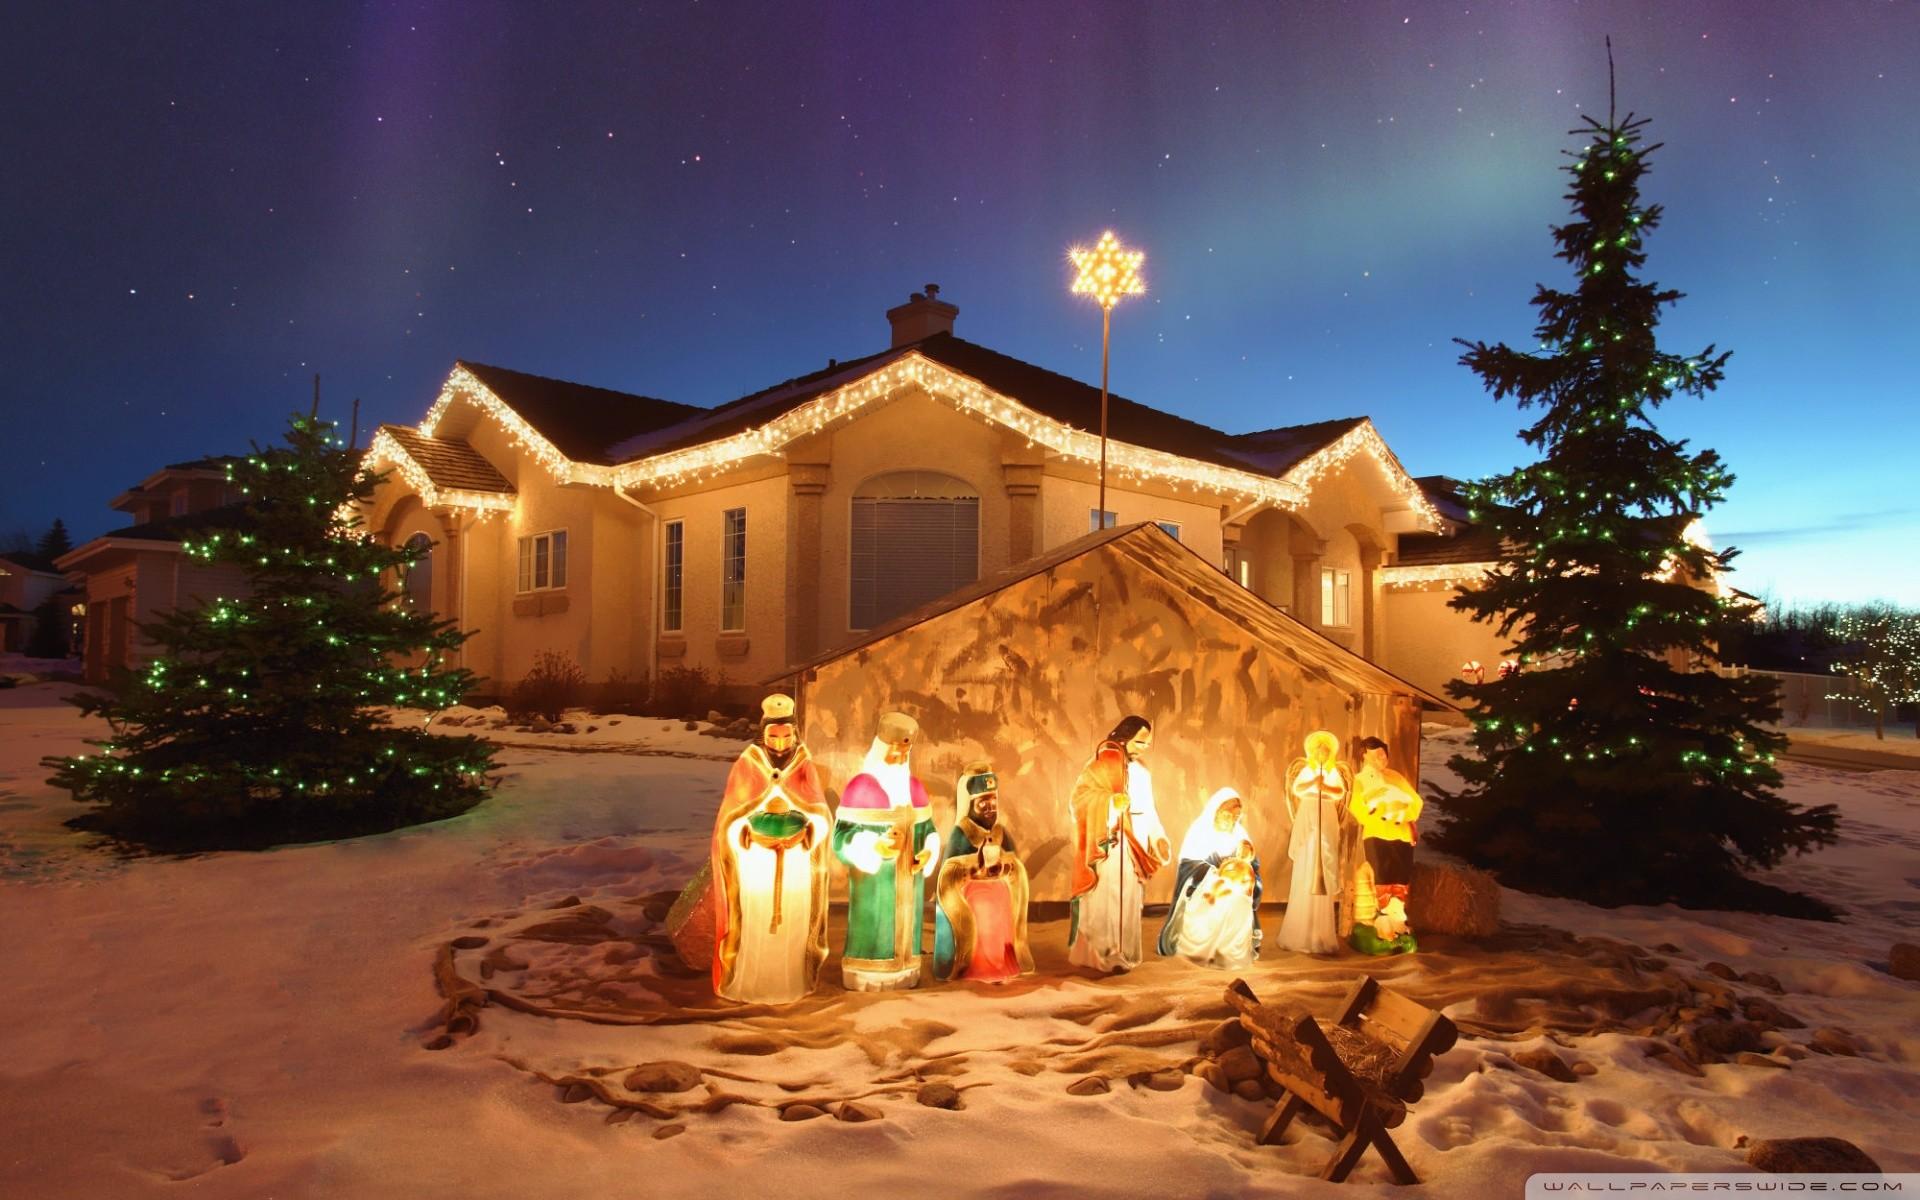 Outdoor Christmas Nativity Scen · outdoor_christmas_nativity_scene-wallpaper -1920×1200